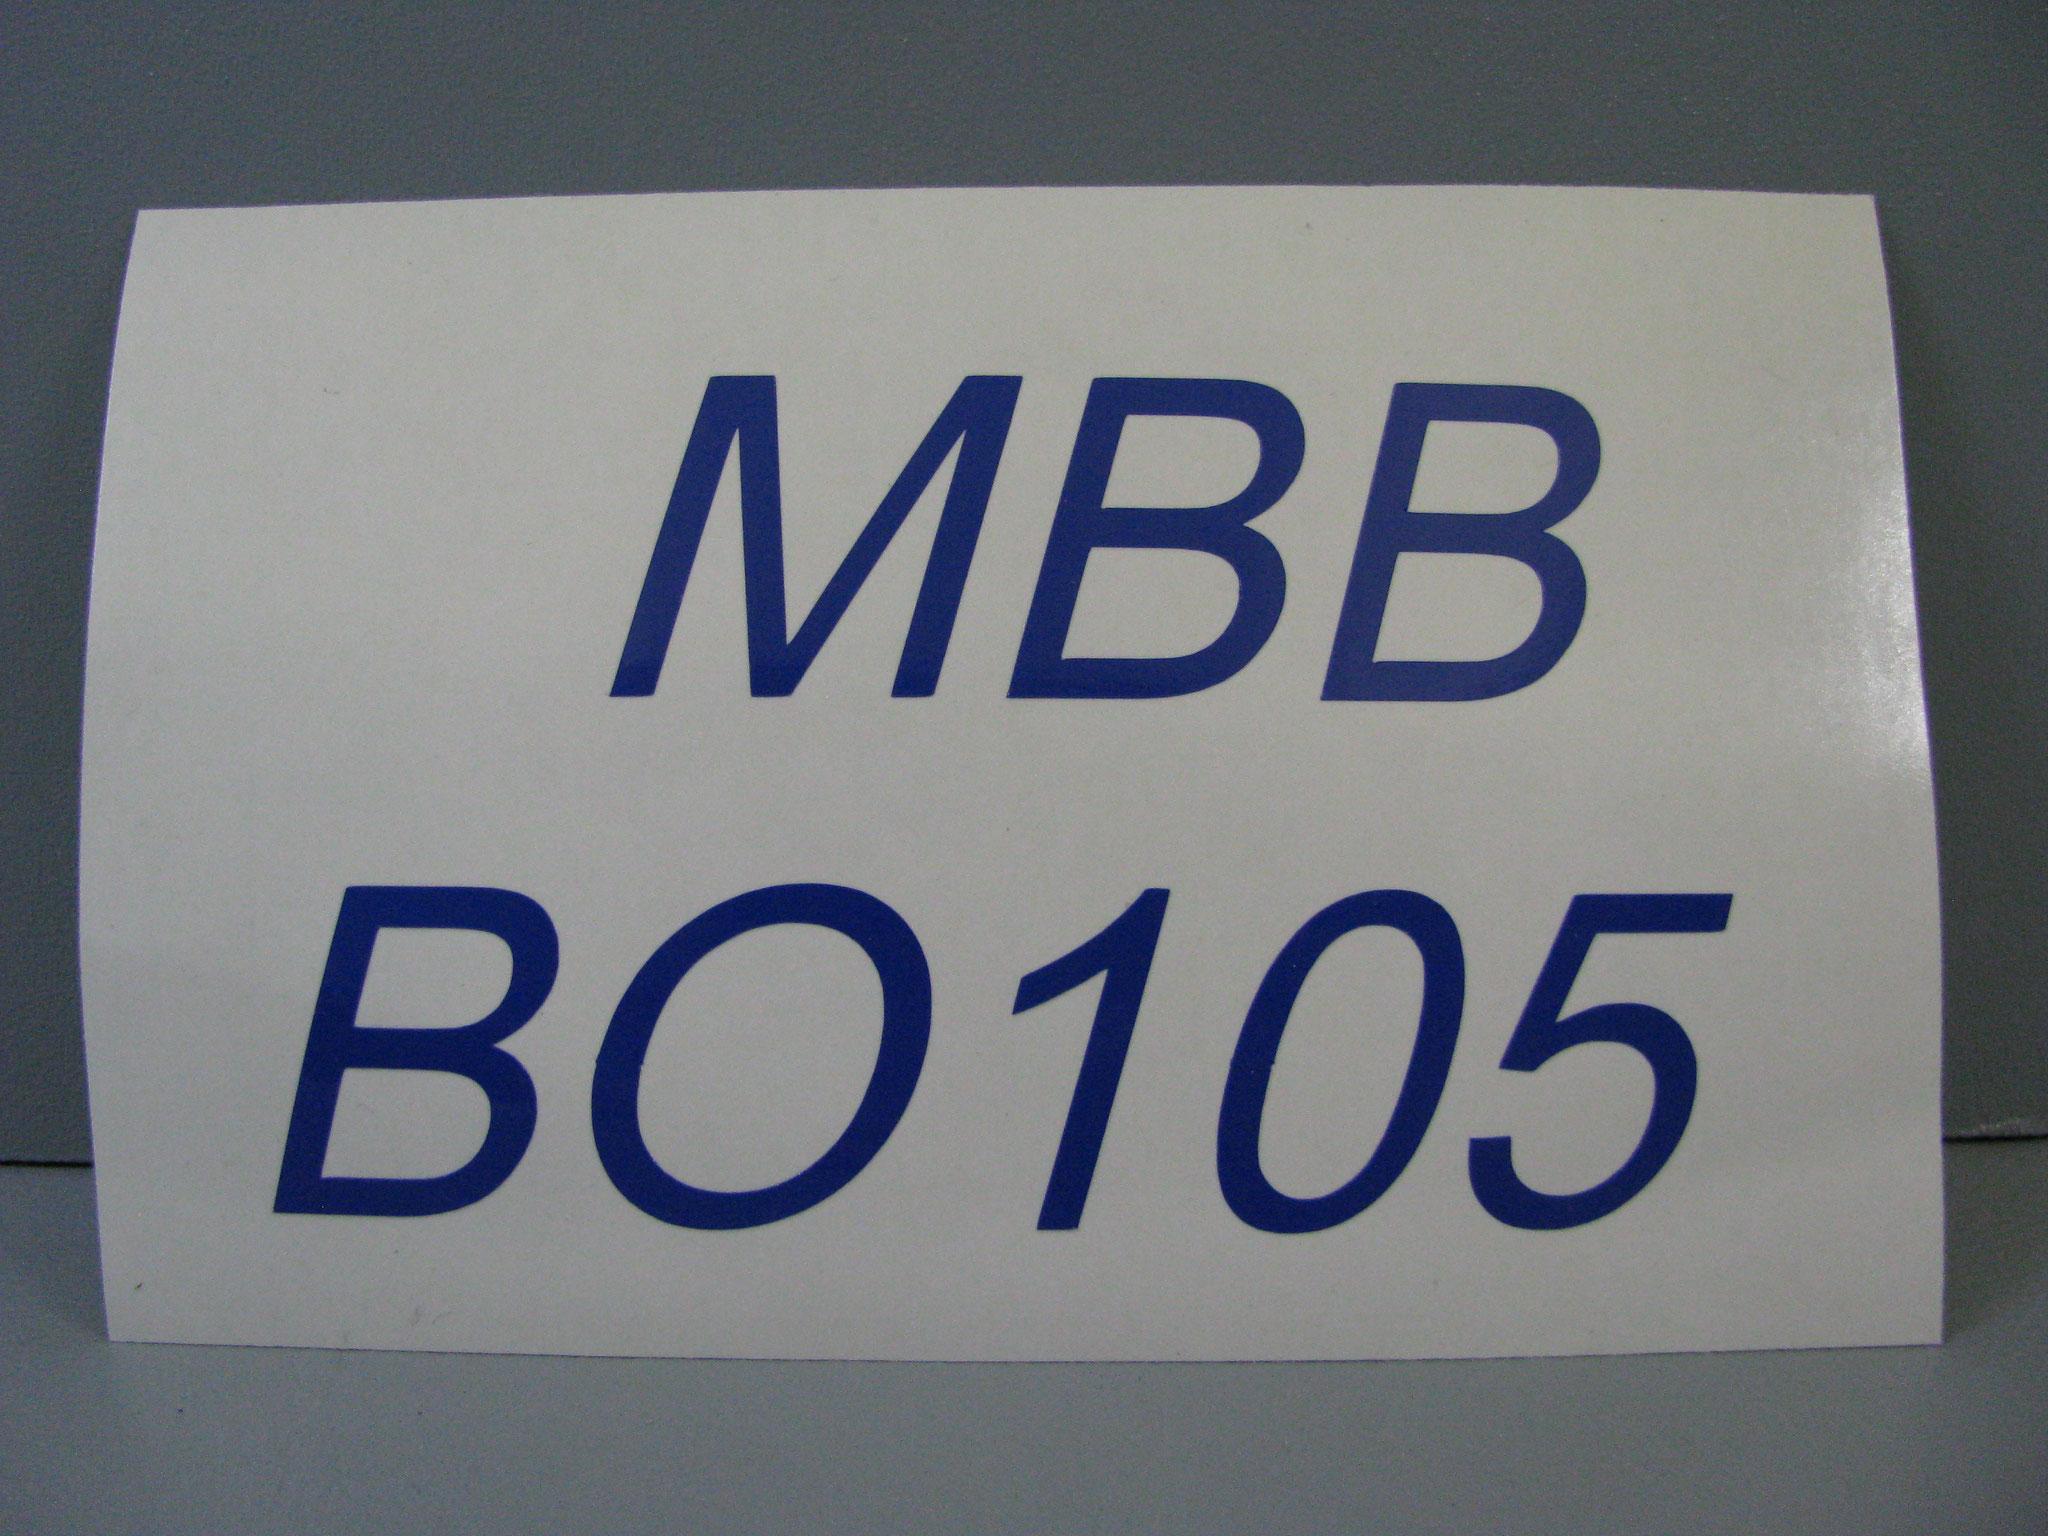 M311: MBB BO105, kursiv, unten angeordnet, z.B. 105x62mm